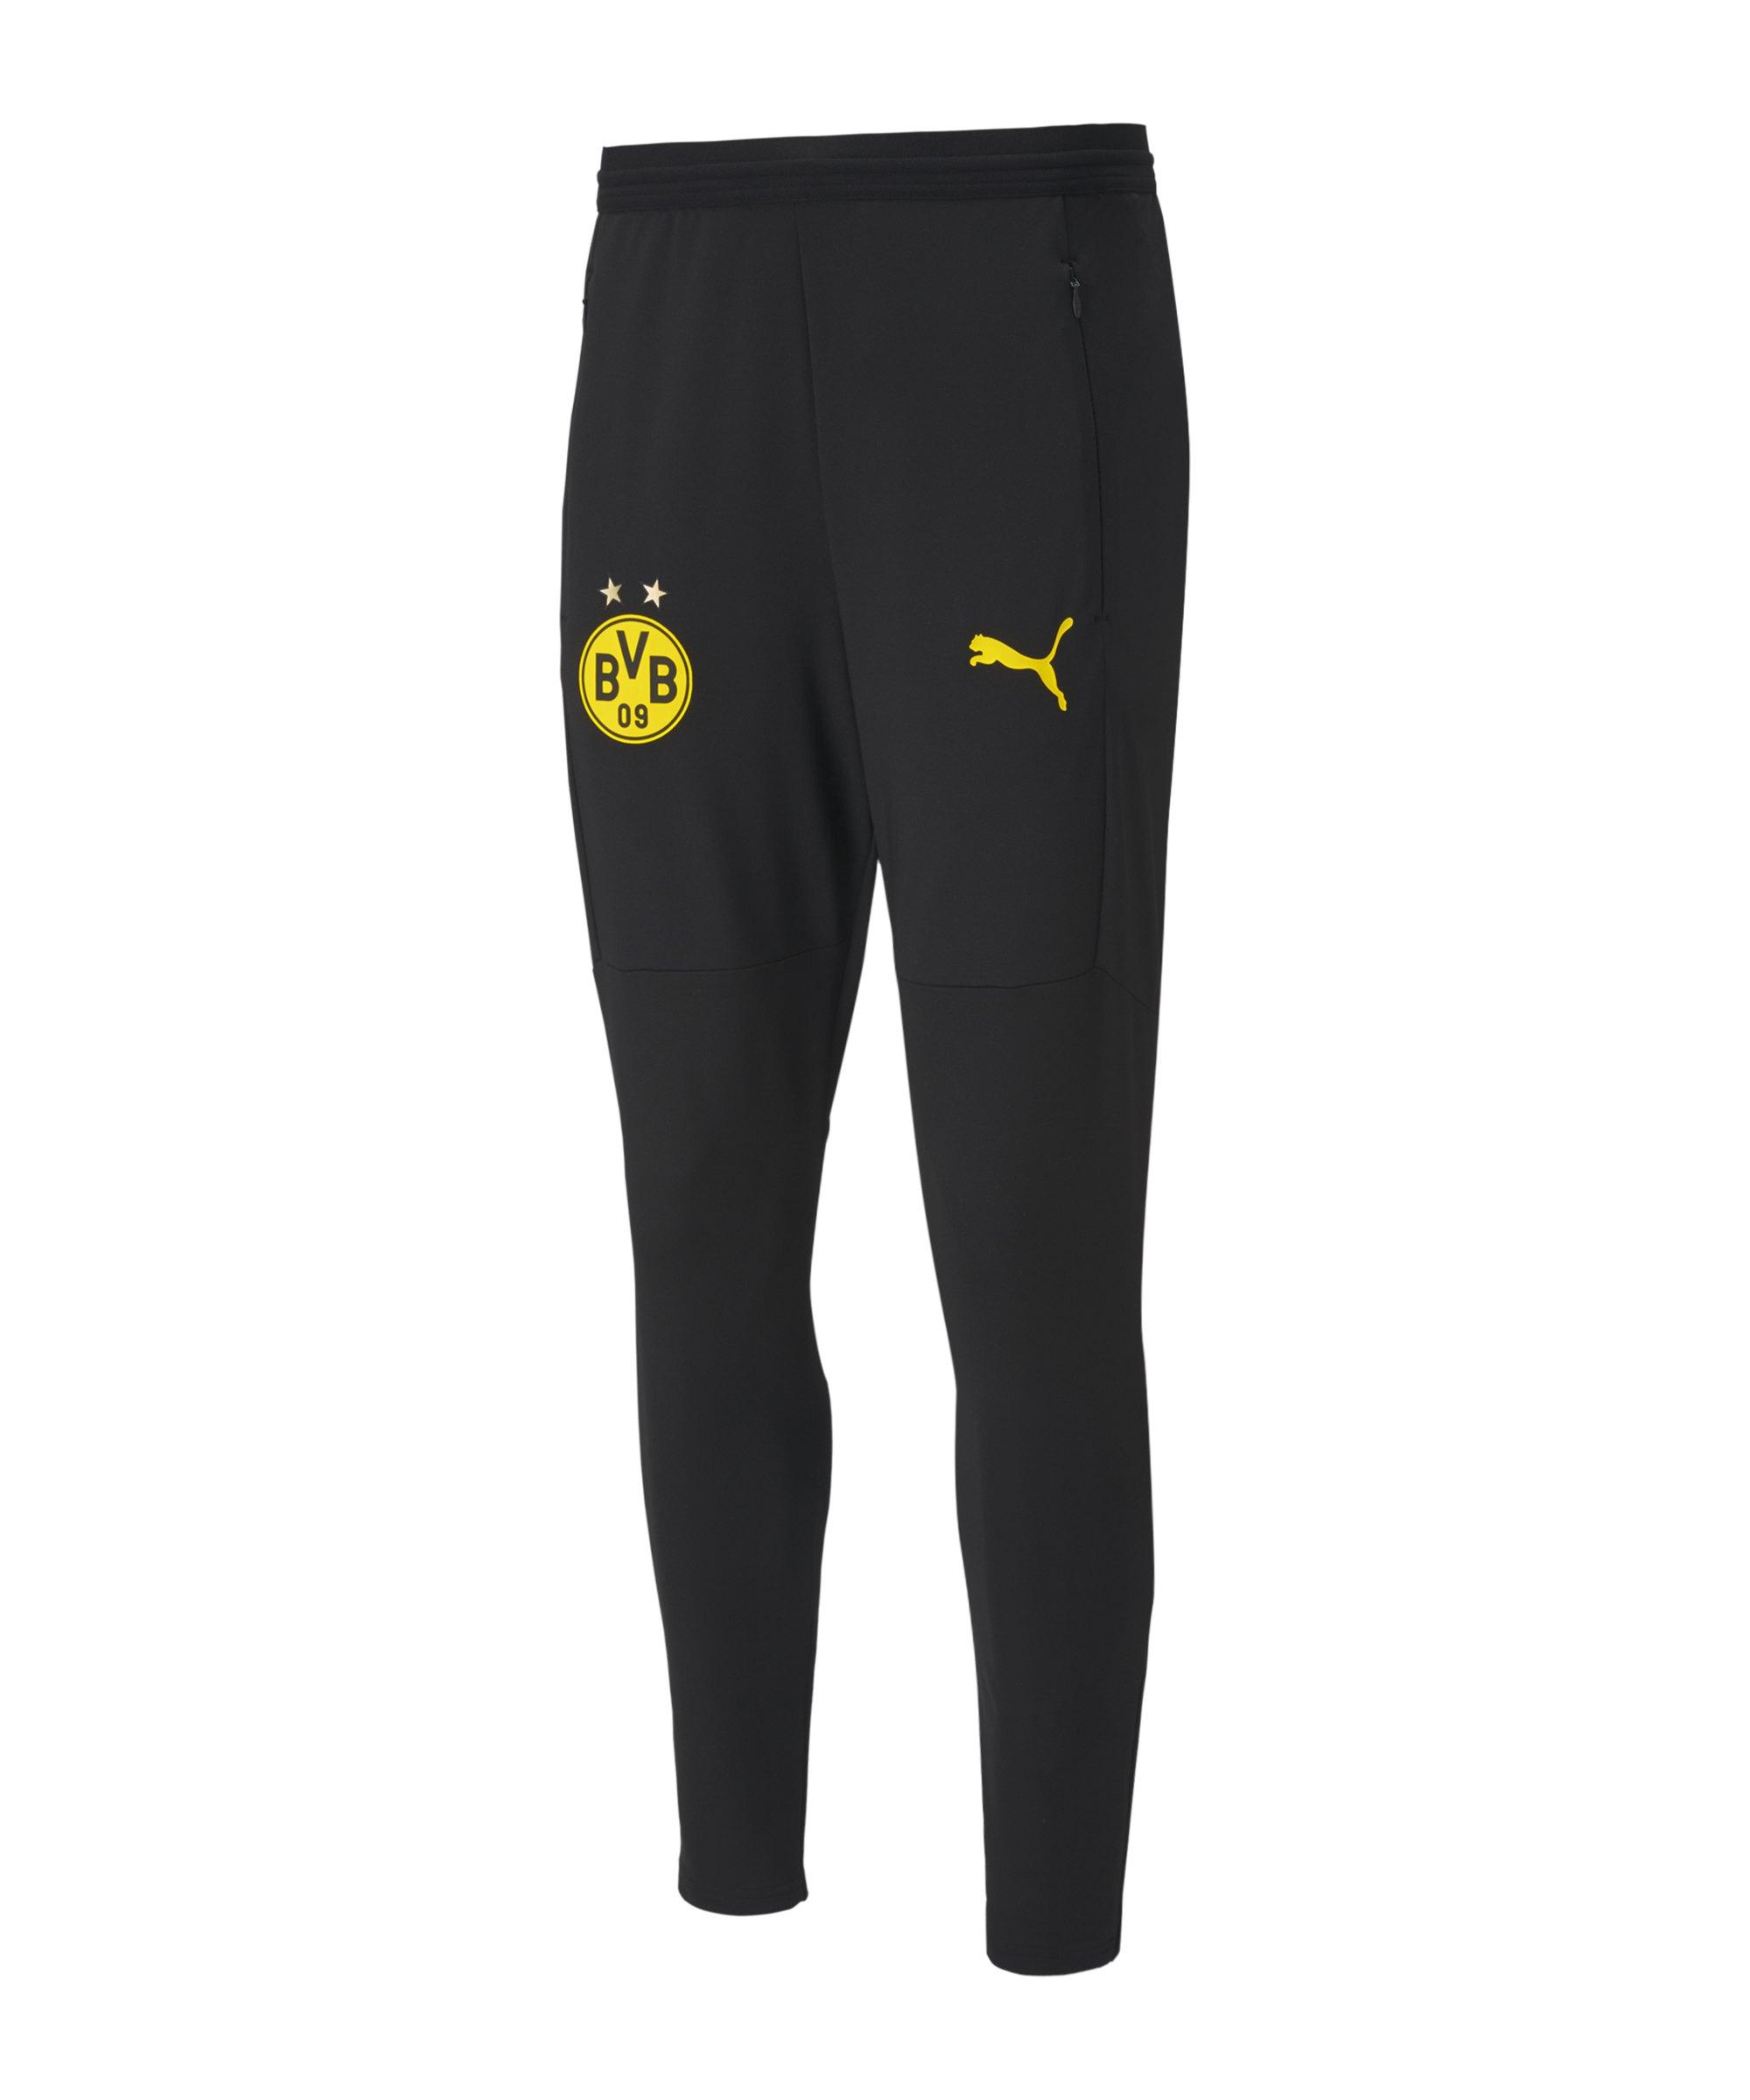 PUMA BVB Dortmund Trainingshose Schwarz F02 - schwarz